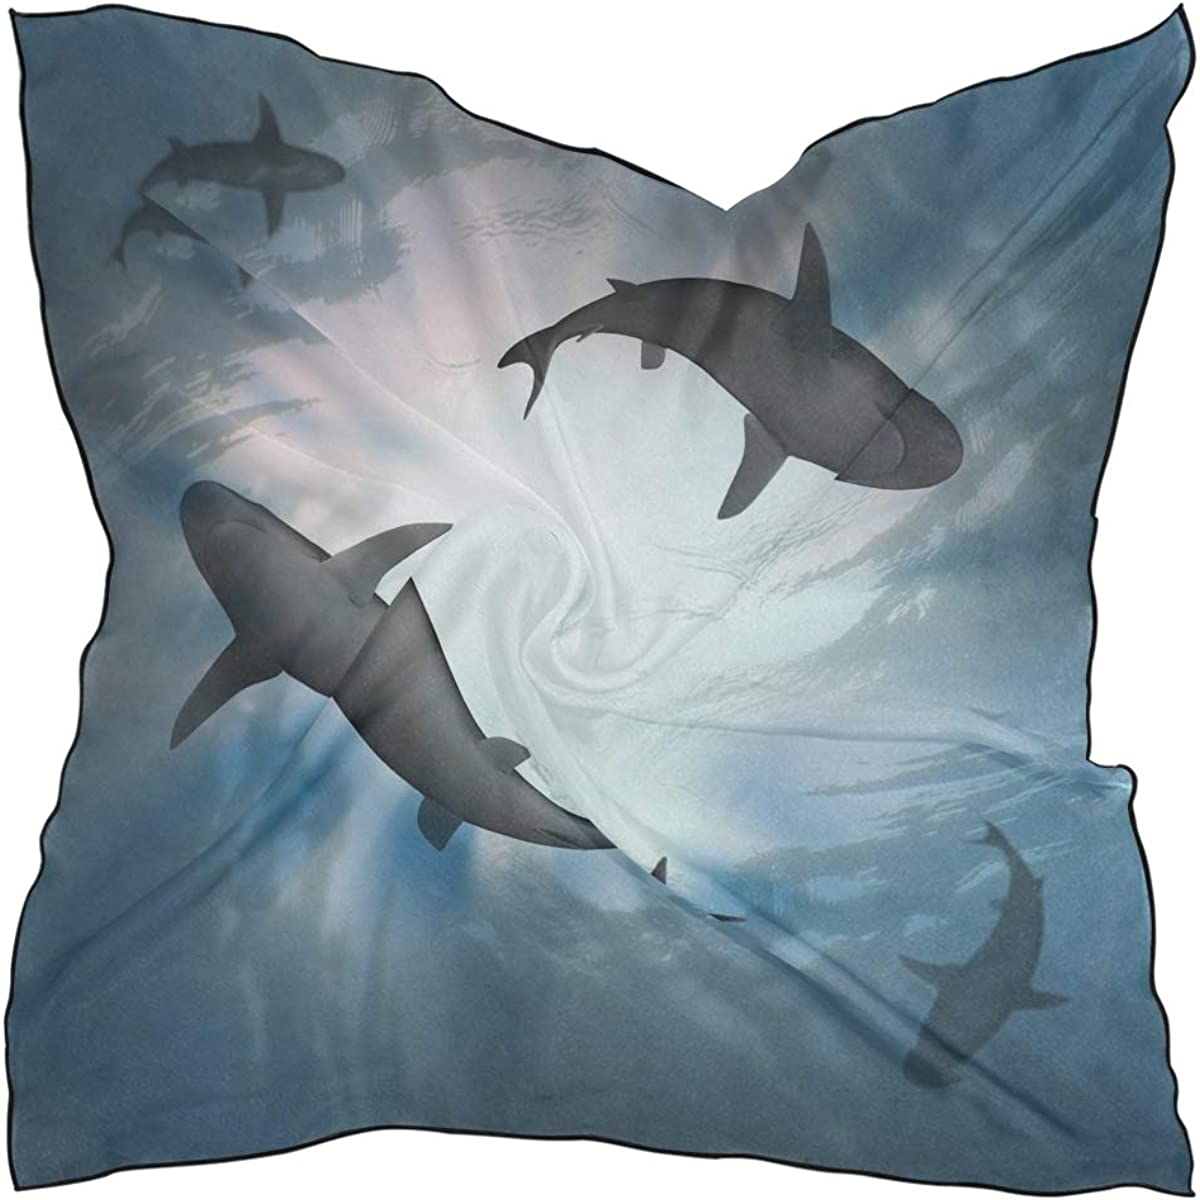 SEULIFE Silk Scarf Blue Water With Shark, Fashion Lightweight Women's Scarf Sheer Shawl Wrap